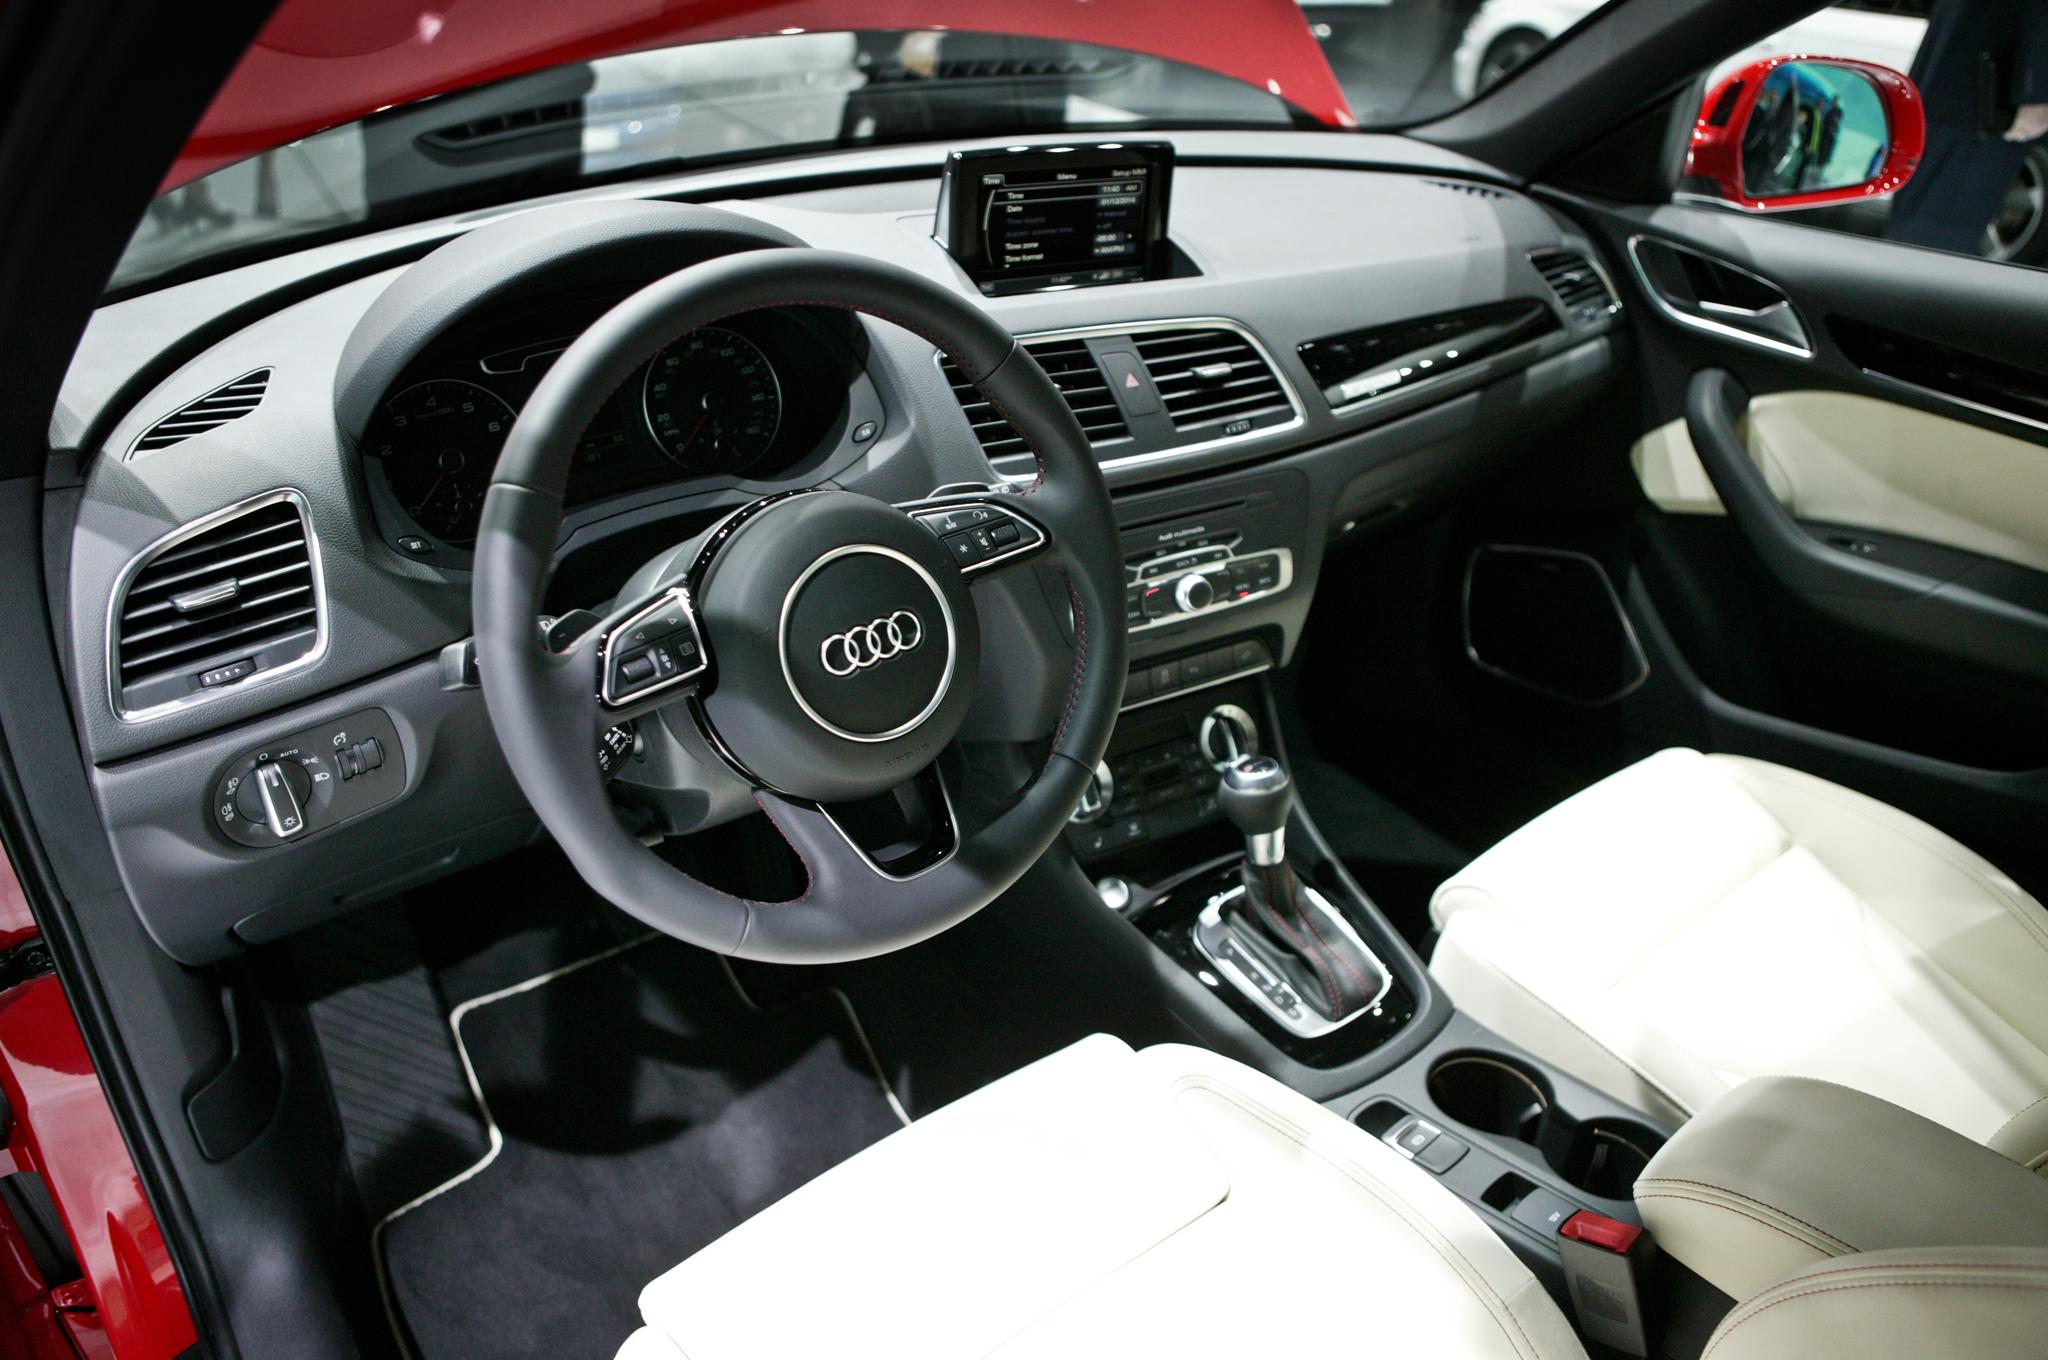 2015 Audi Q3 Dashboard and Cockpit